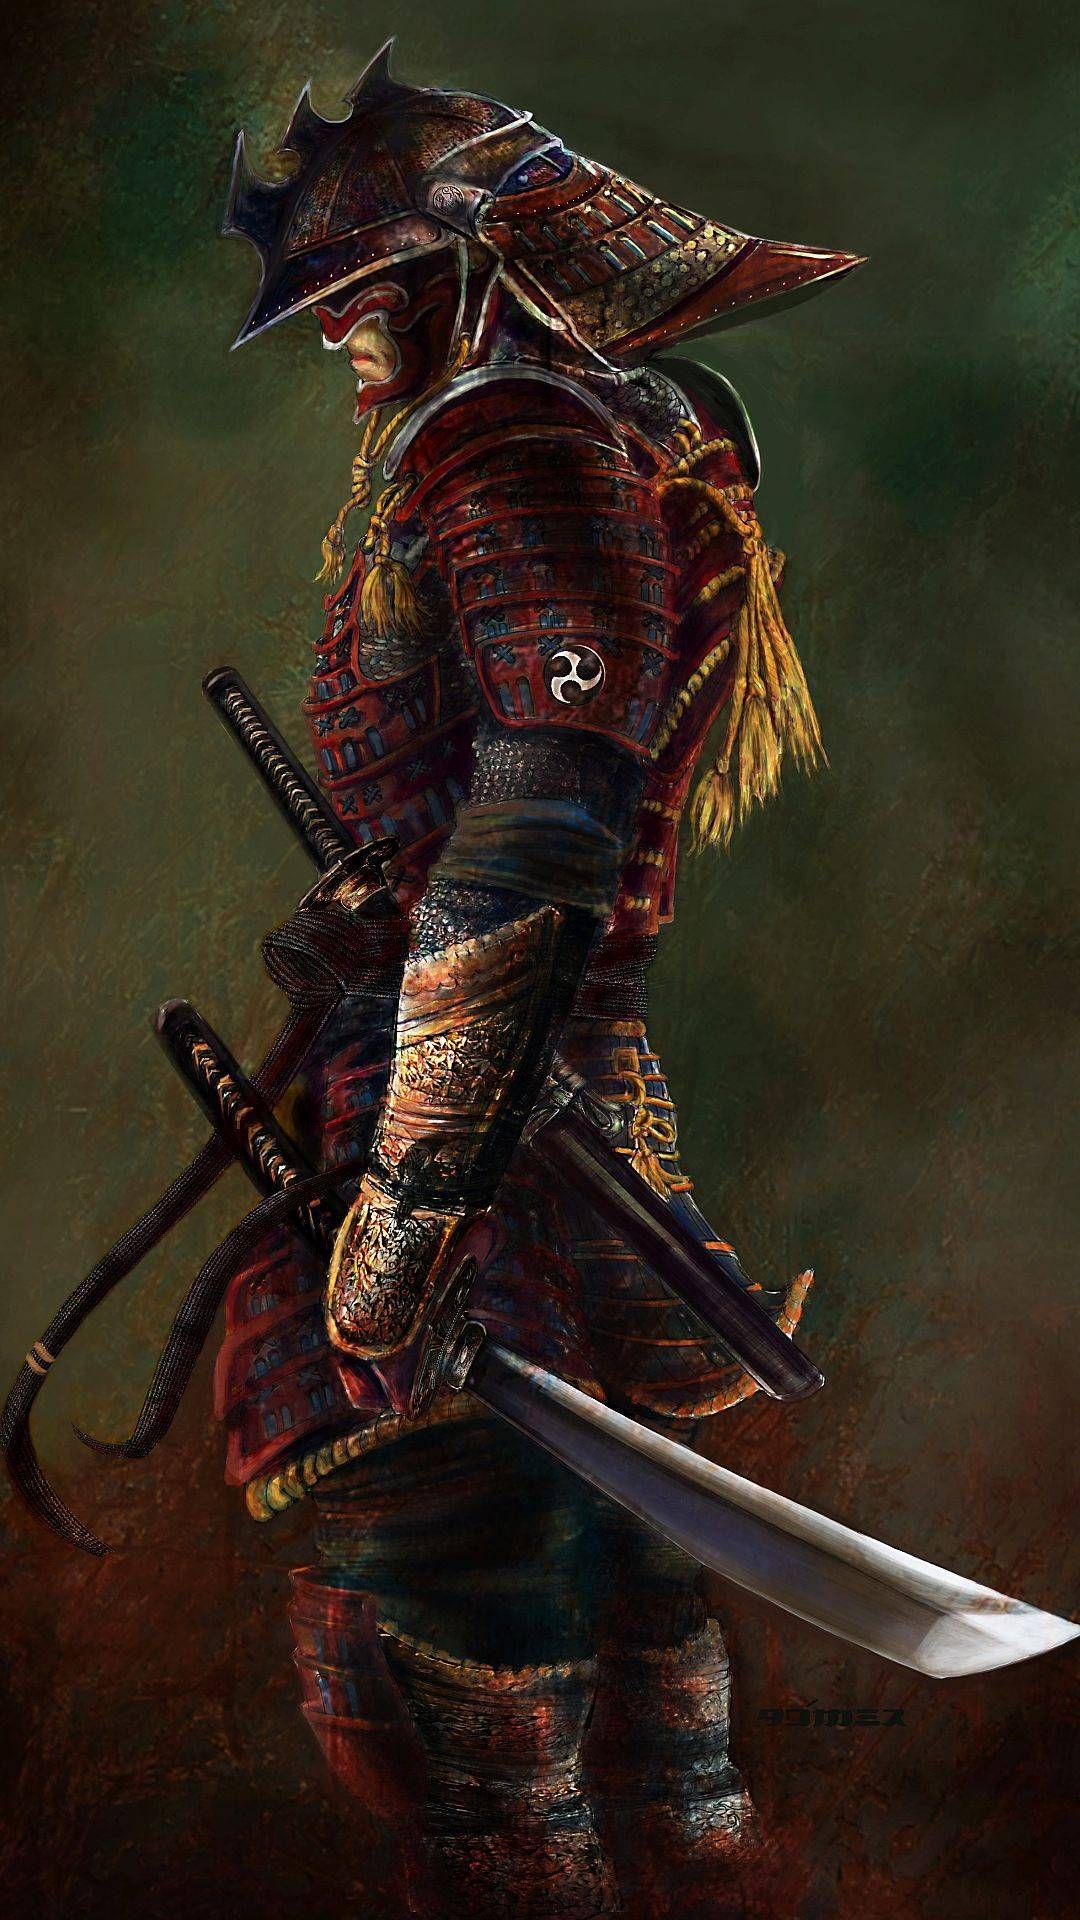 Samurai Warrior Mobile Hd Wallpapers In 2020 Samurai Warrior Samurai Tattoo Design Samurai Wallpaper